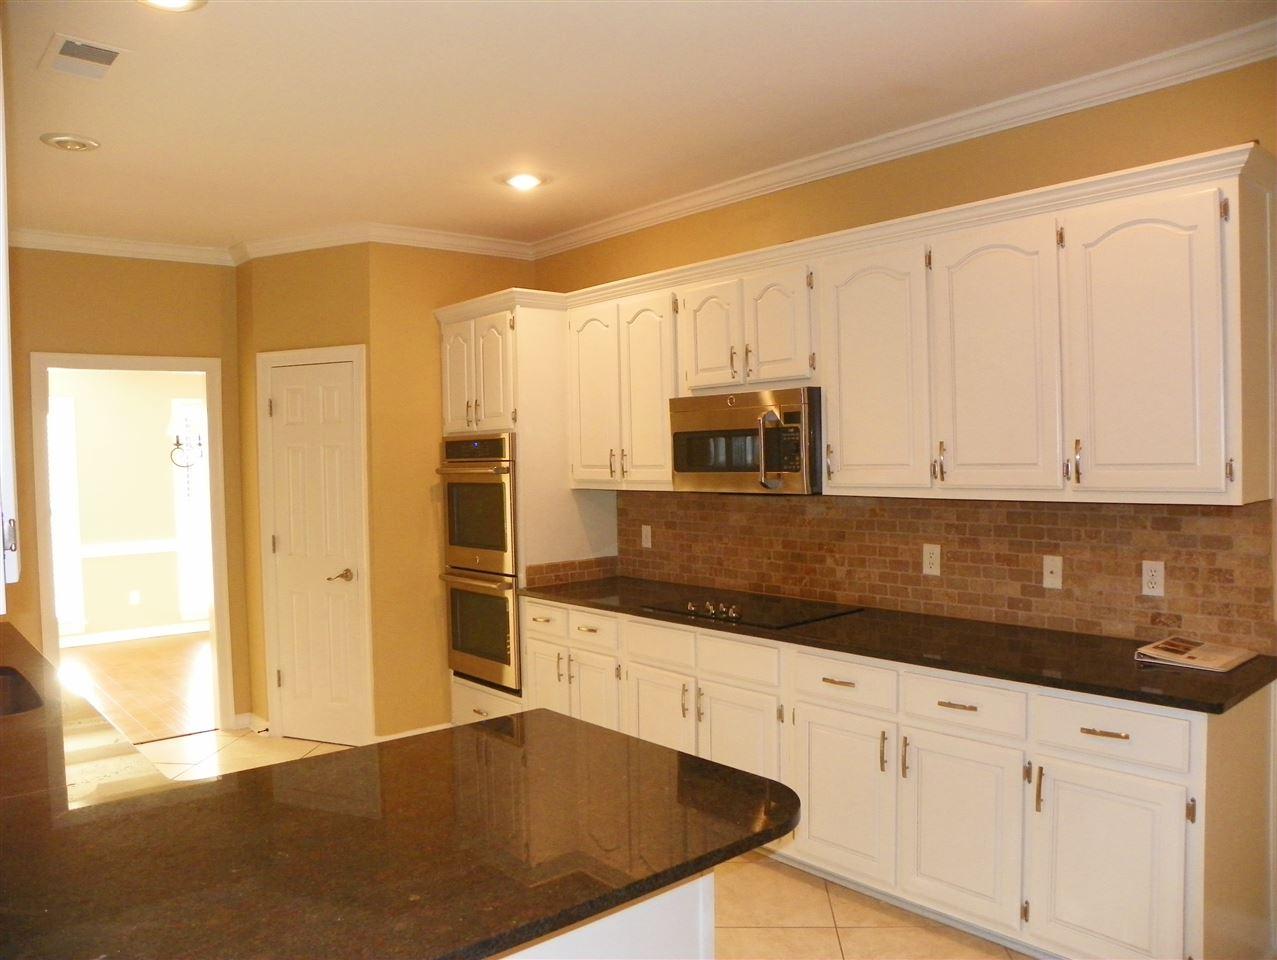 1527 Collingham Collierville, TN 38017 - MLS #: 10027458